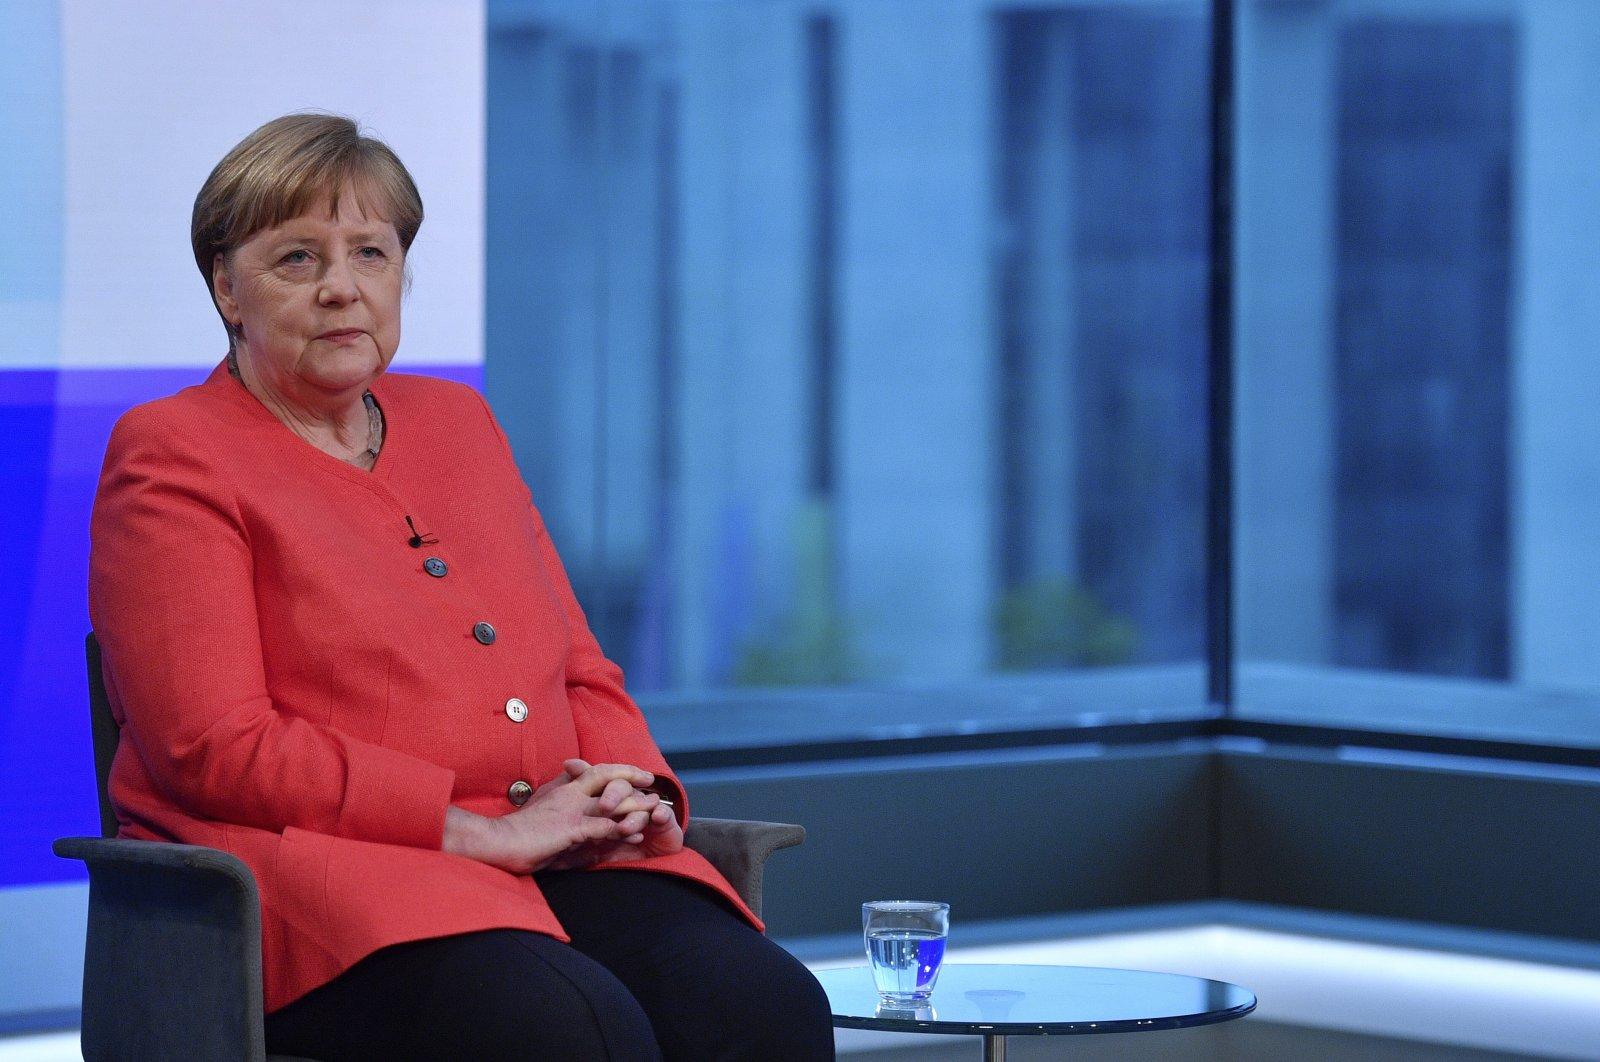 German Chancellor Angela Merkel, ahead of a televised interview at the ARD-Hauptstadtstudio of public broadcaster ARD, Berlin, Germany, June 4, 2020. (AP Photo)